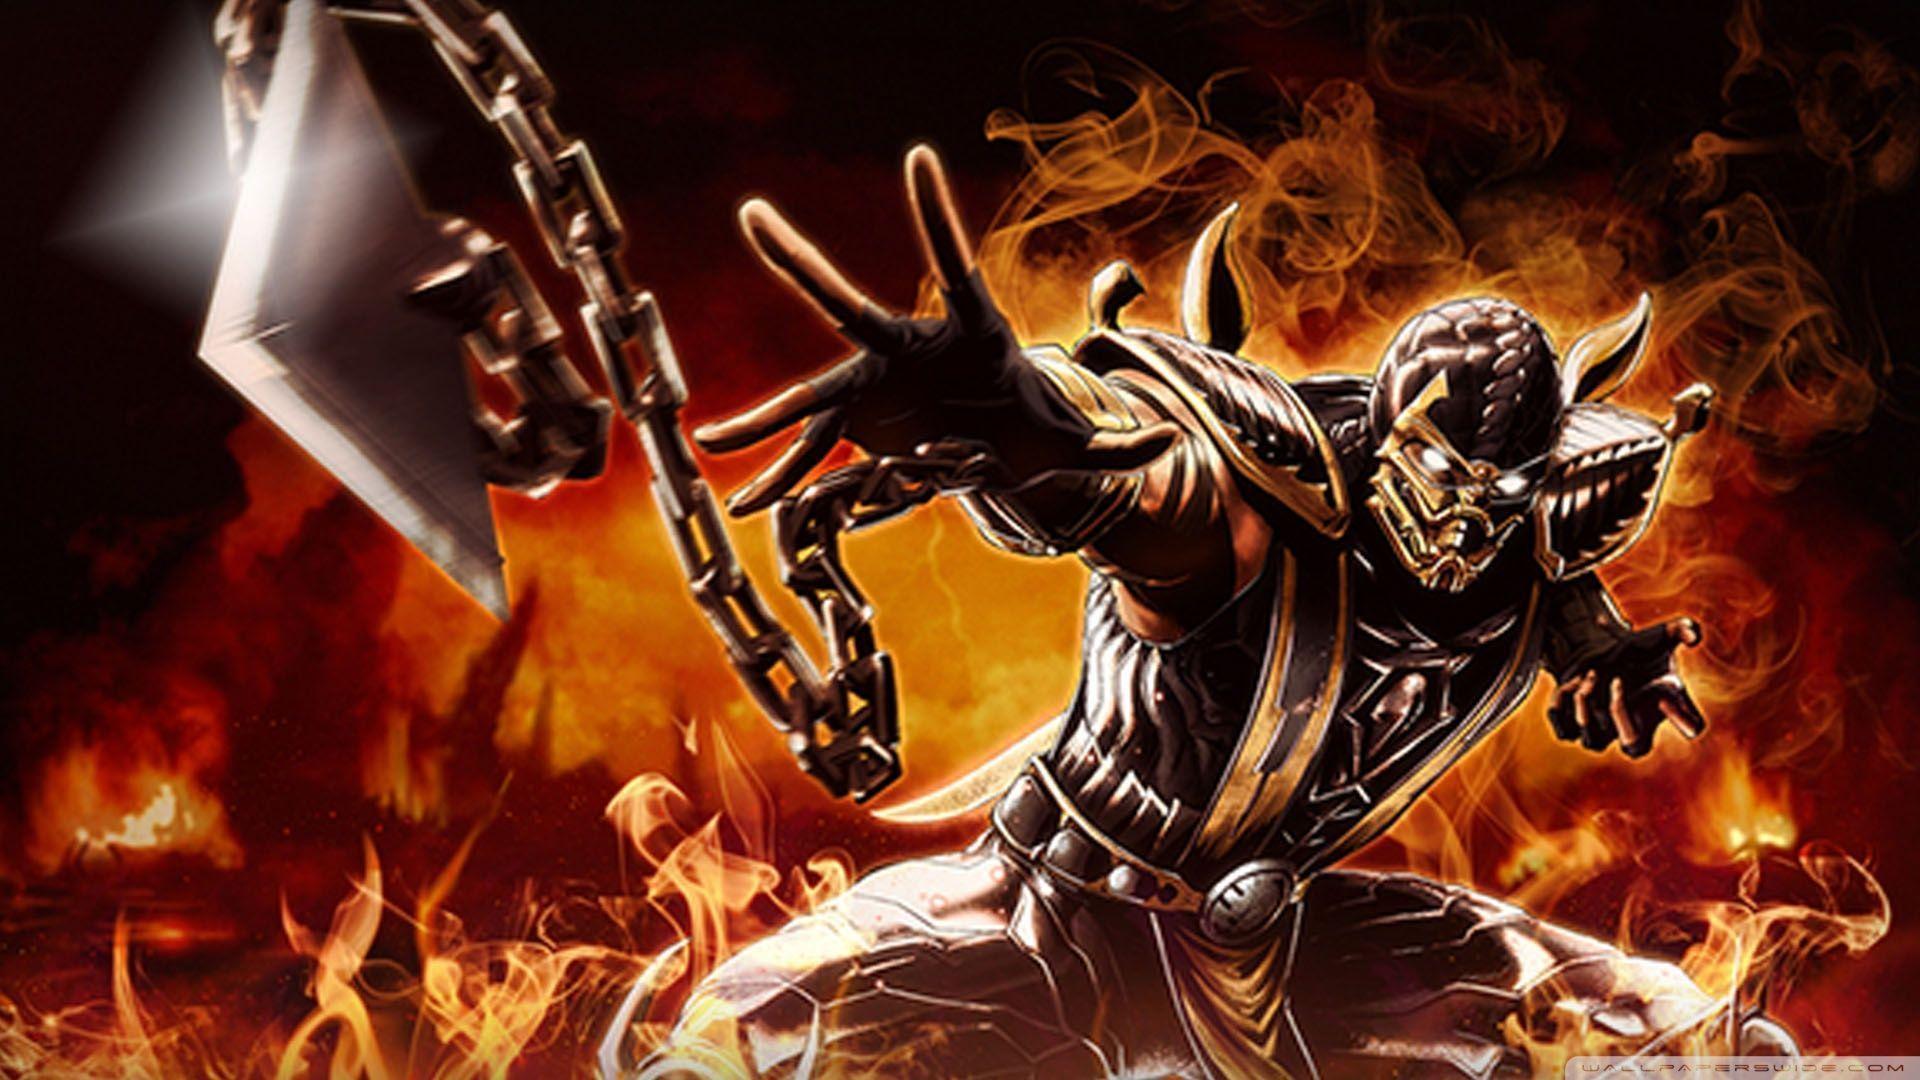 Mortal Kombat Scorpion Wallpapers 1920x1080